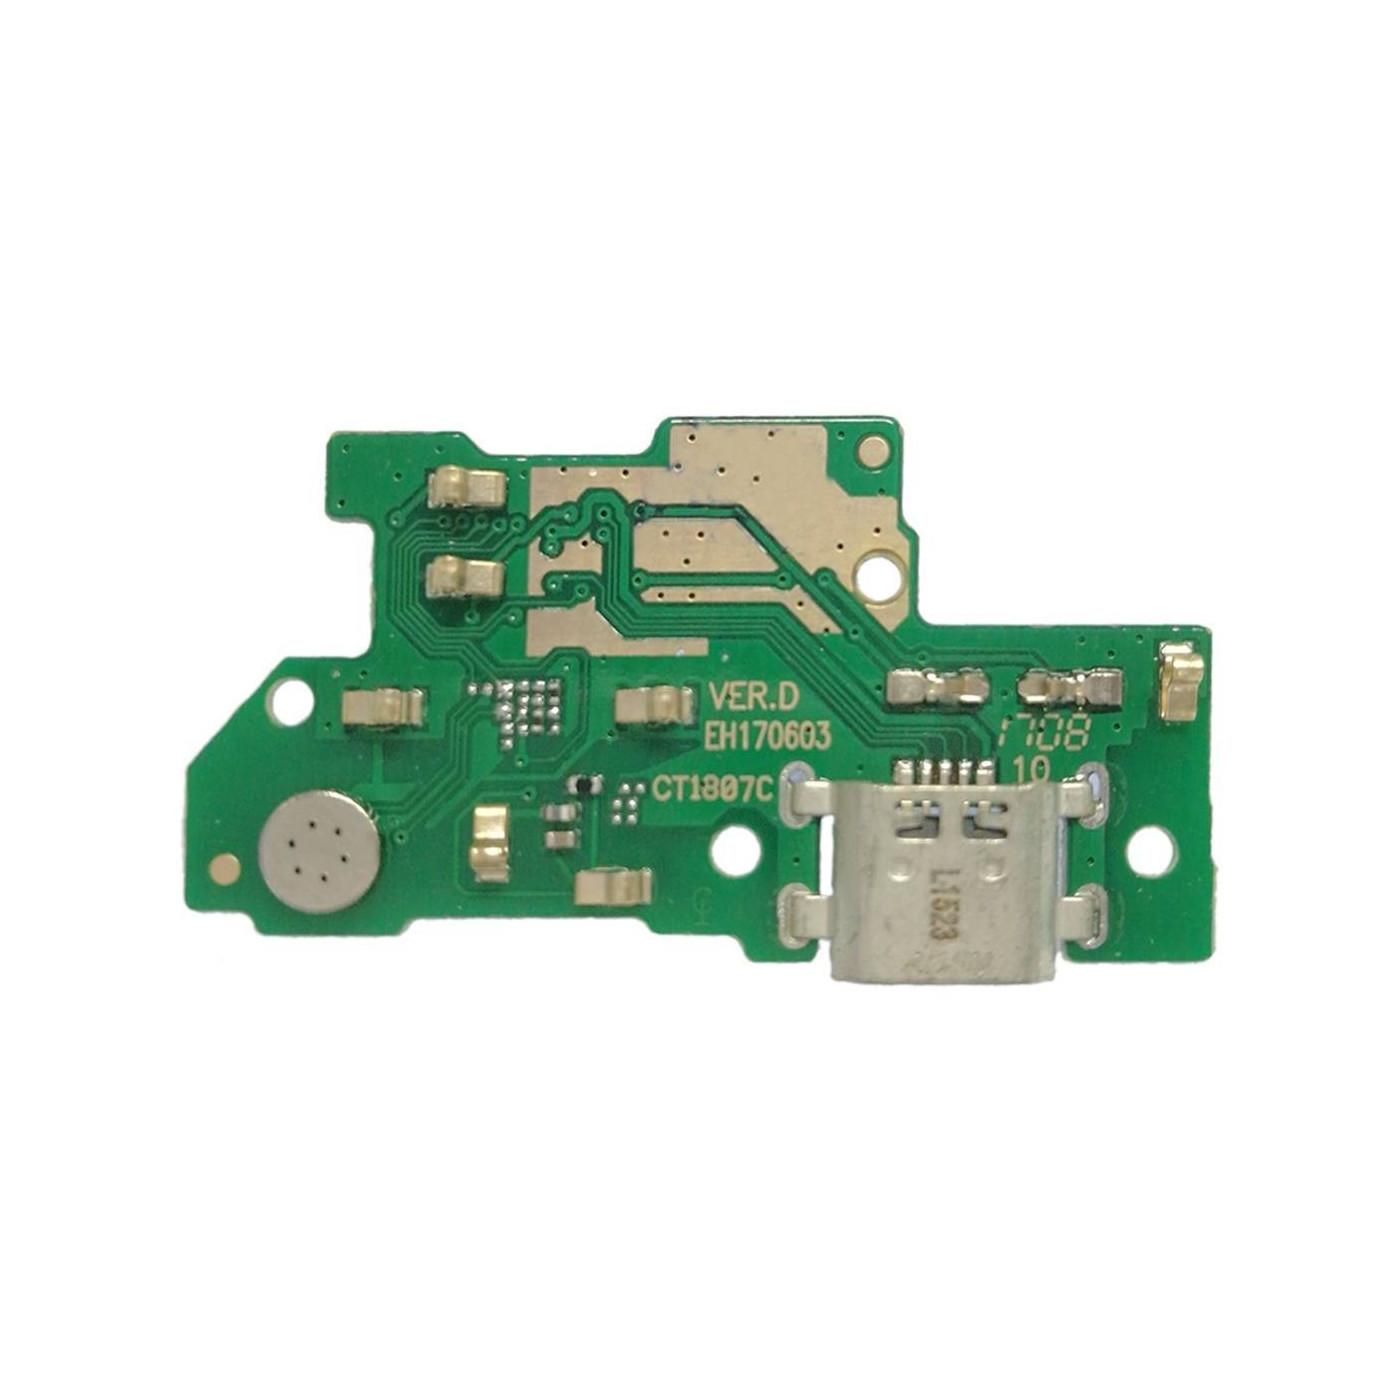 Flat flex charging connector for Huawei Y7